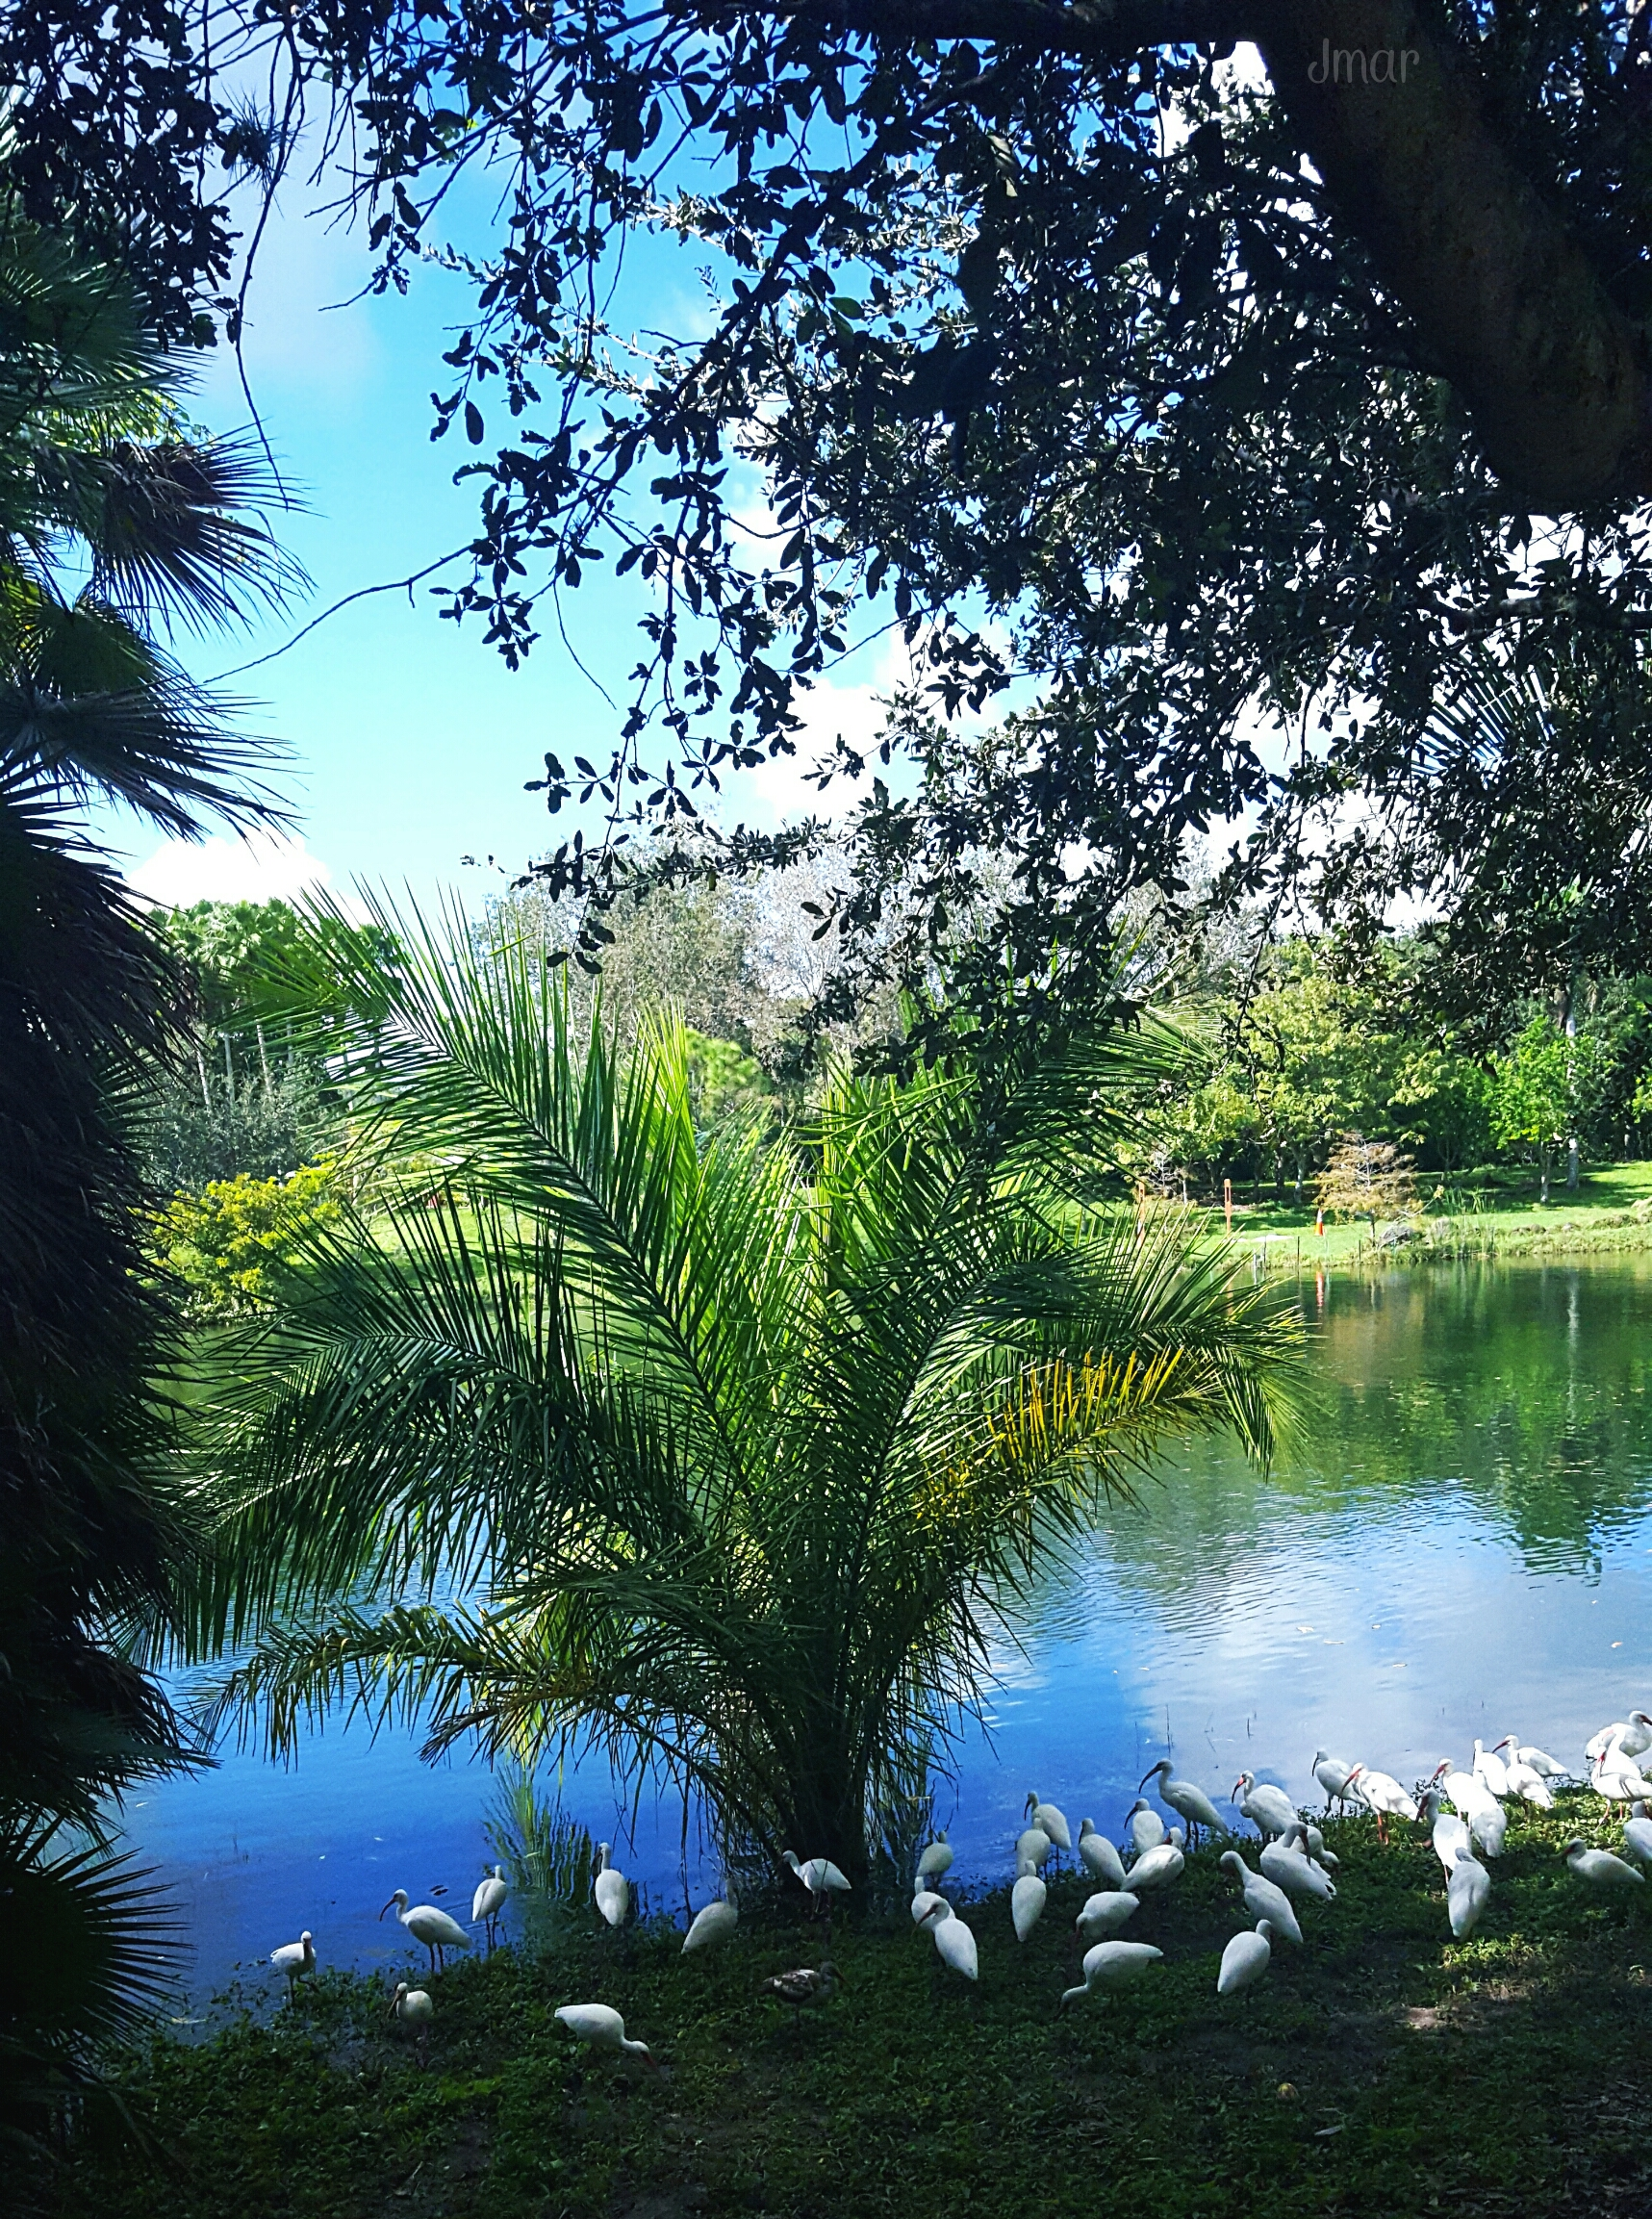 Good Morning Sunshine Vilma Santos : Good morning pa friends sunshine colorful nature seaso